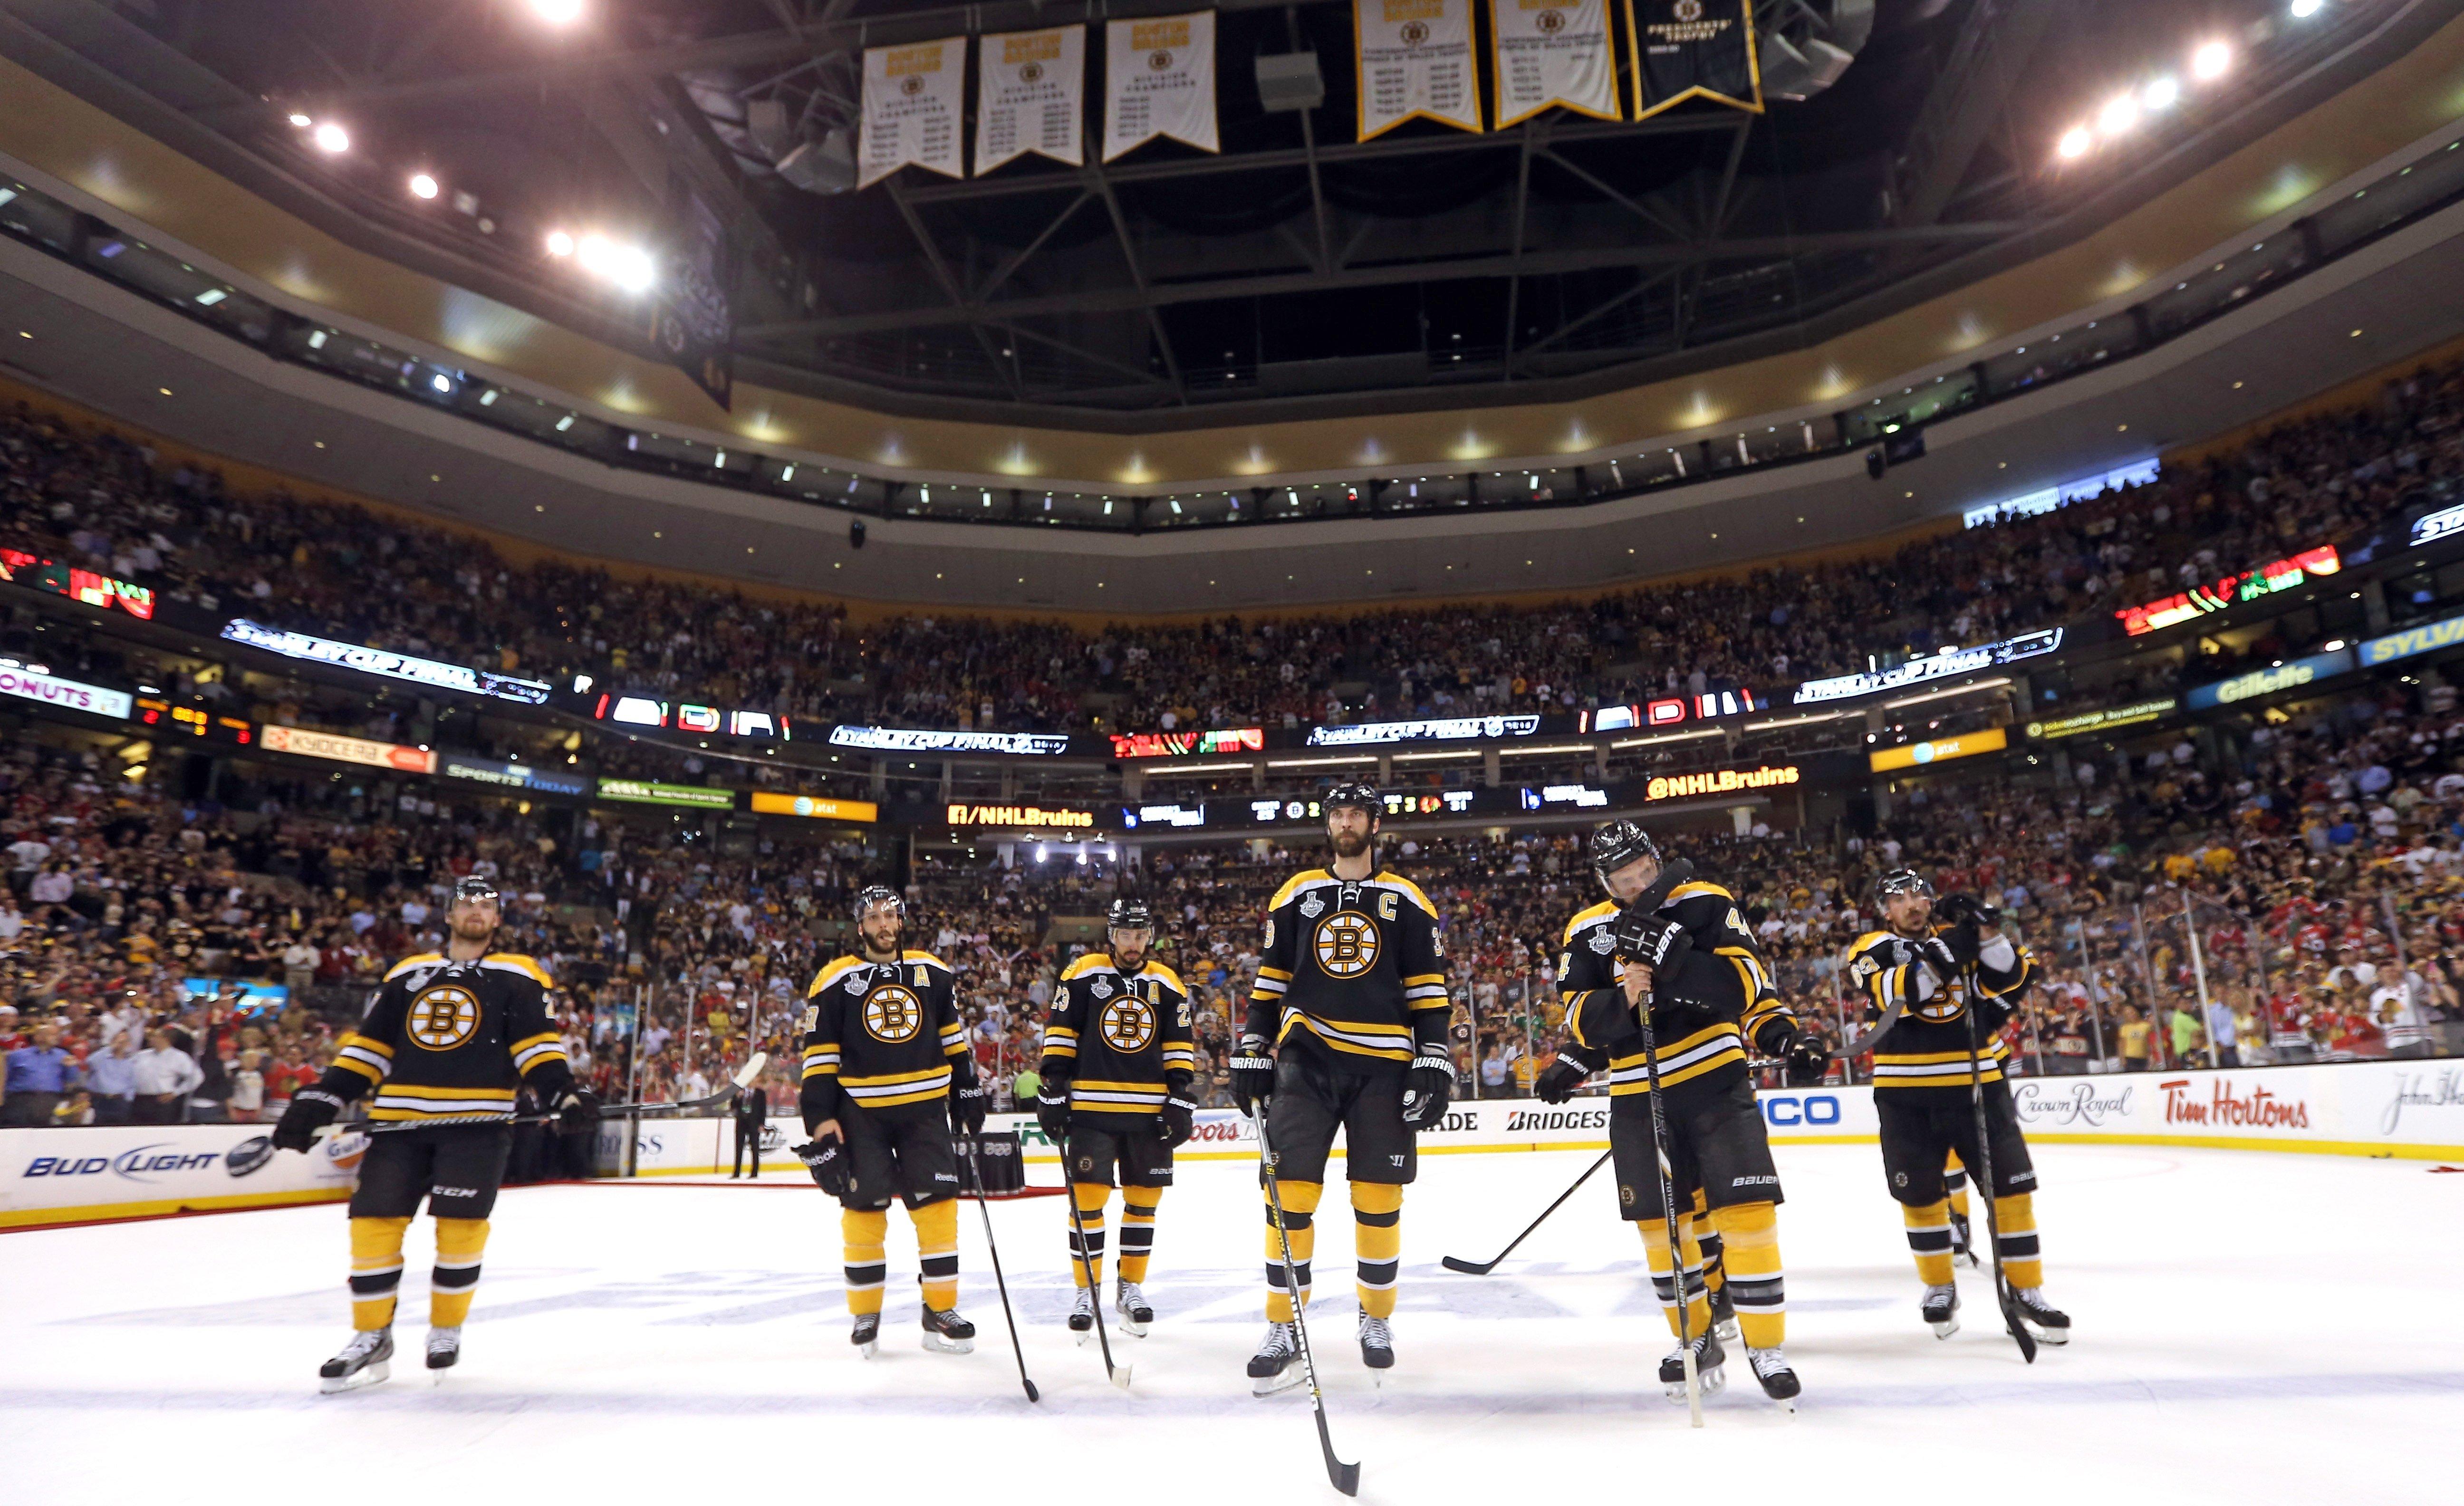 BOSTON BRUINS nhl hockey 87 wallpaper 5184x3168 336519